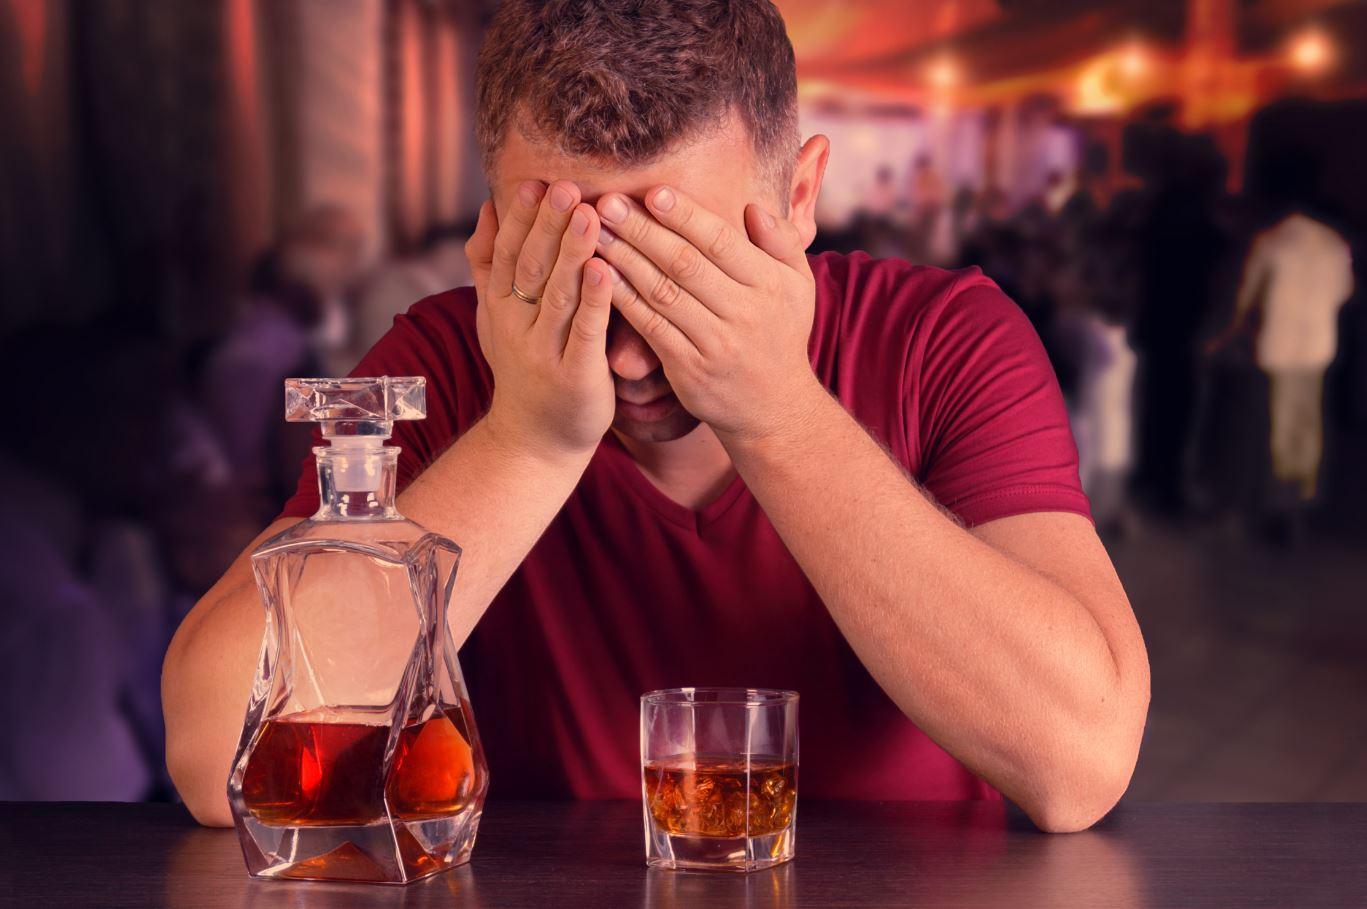 drinking alones